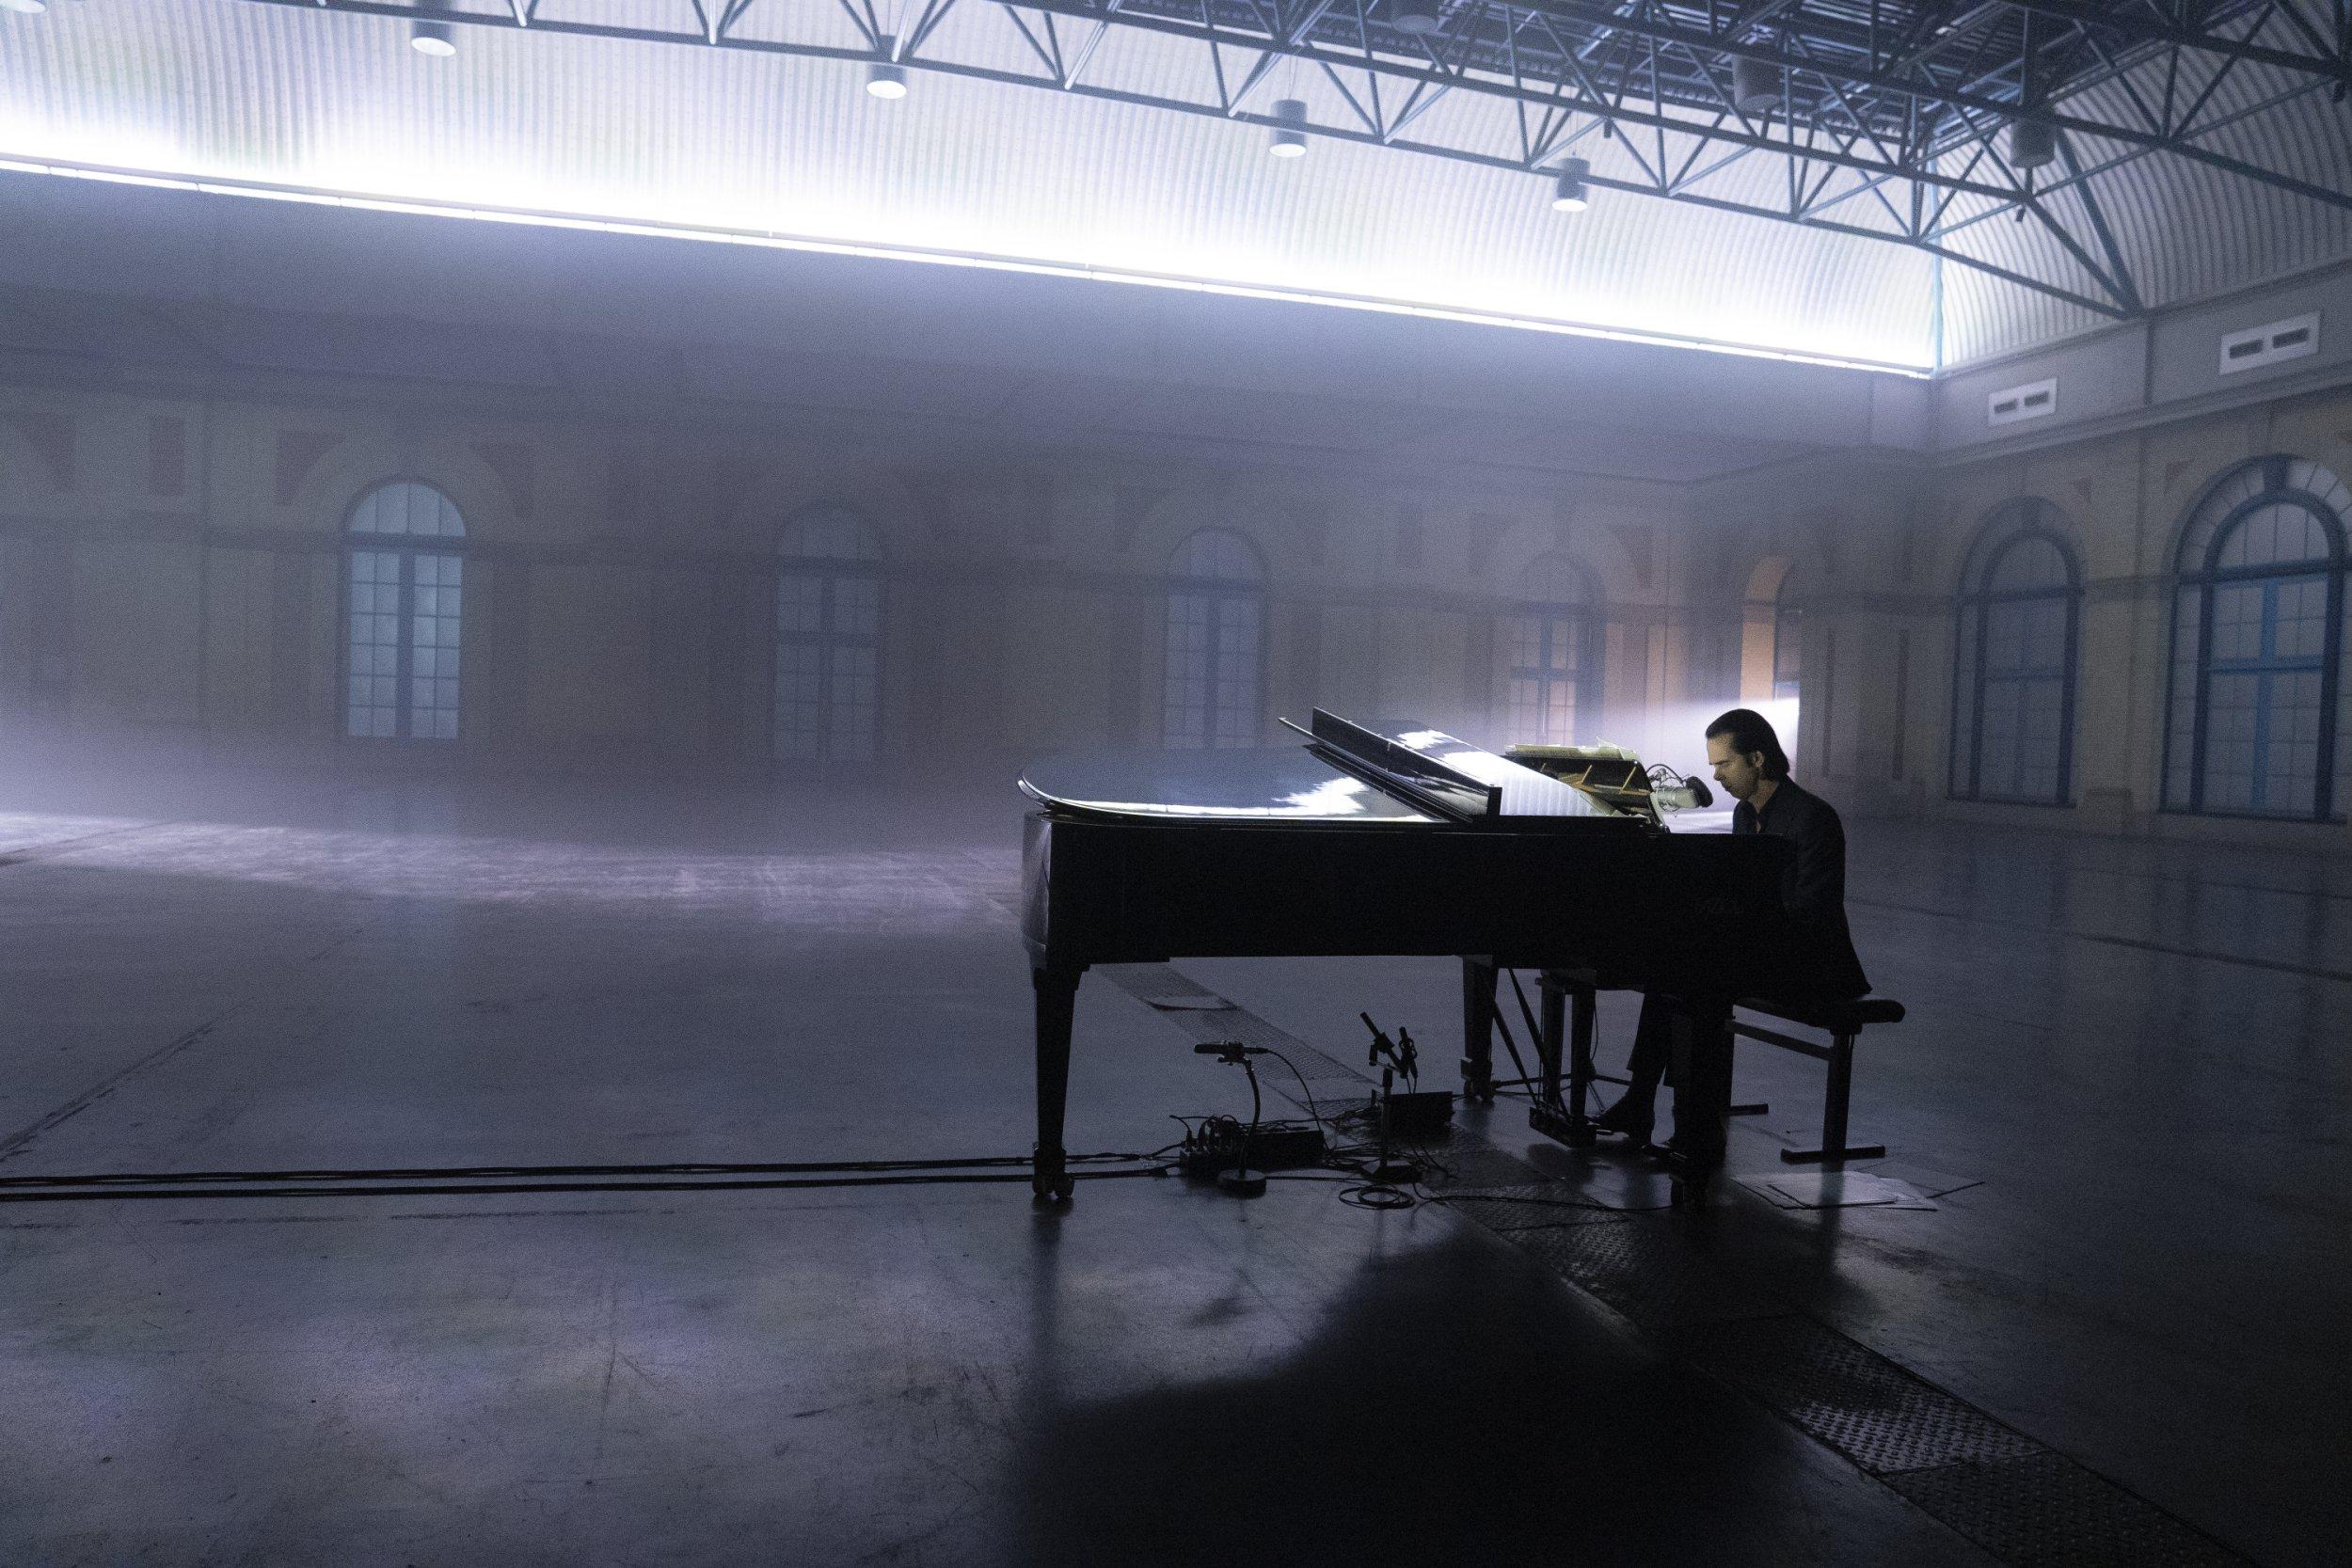 Nick Cave Alone at Alexandra Palace Credit: Joel Ryan Provided by suzi.goodrich@googlemail.com